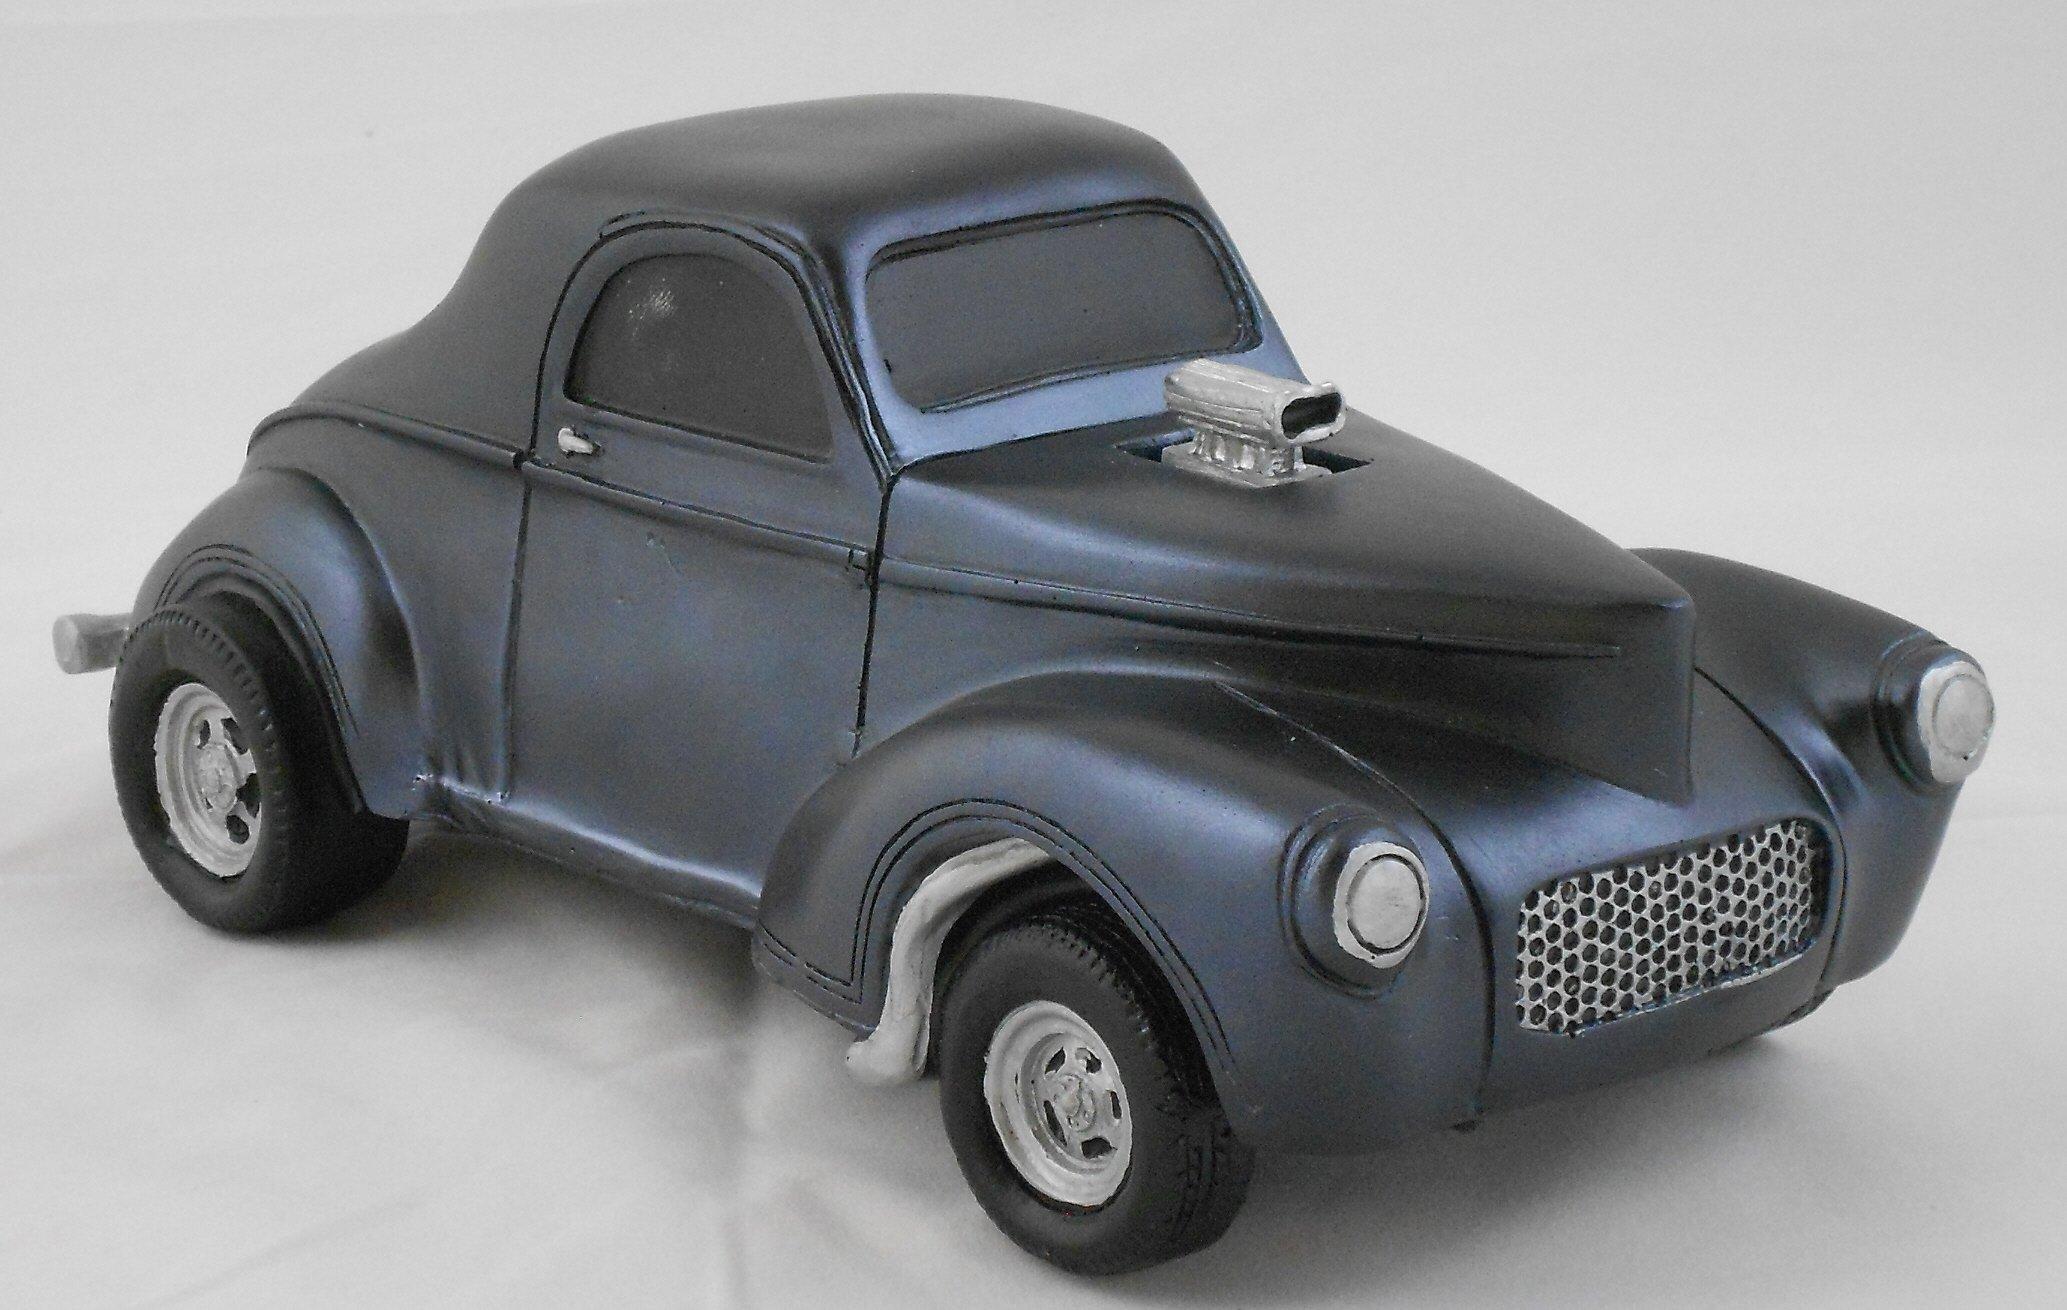 Gasser Model 1941 Willys 1:18 Scale Black by Gasser Models (Image #5)